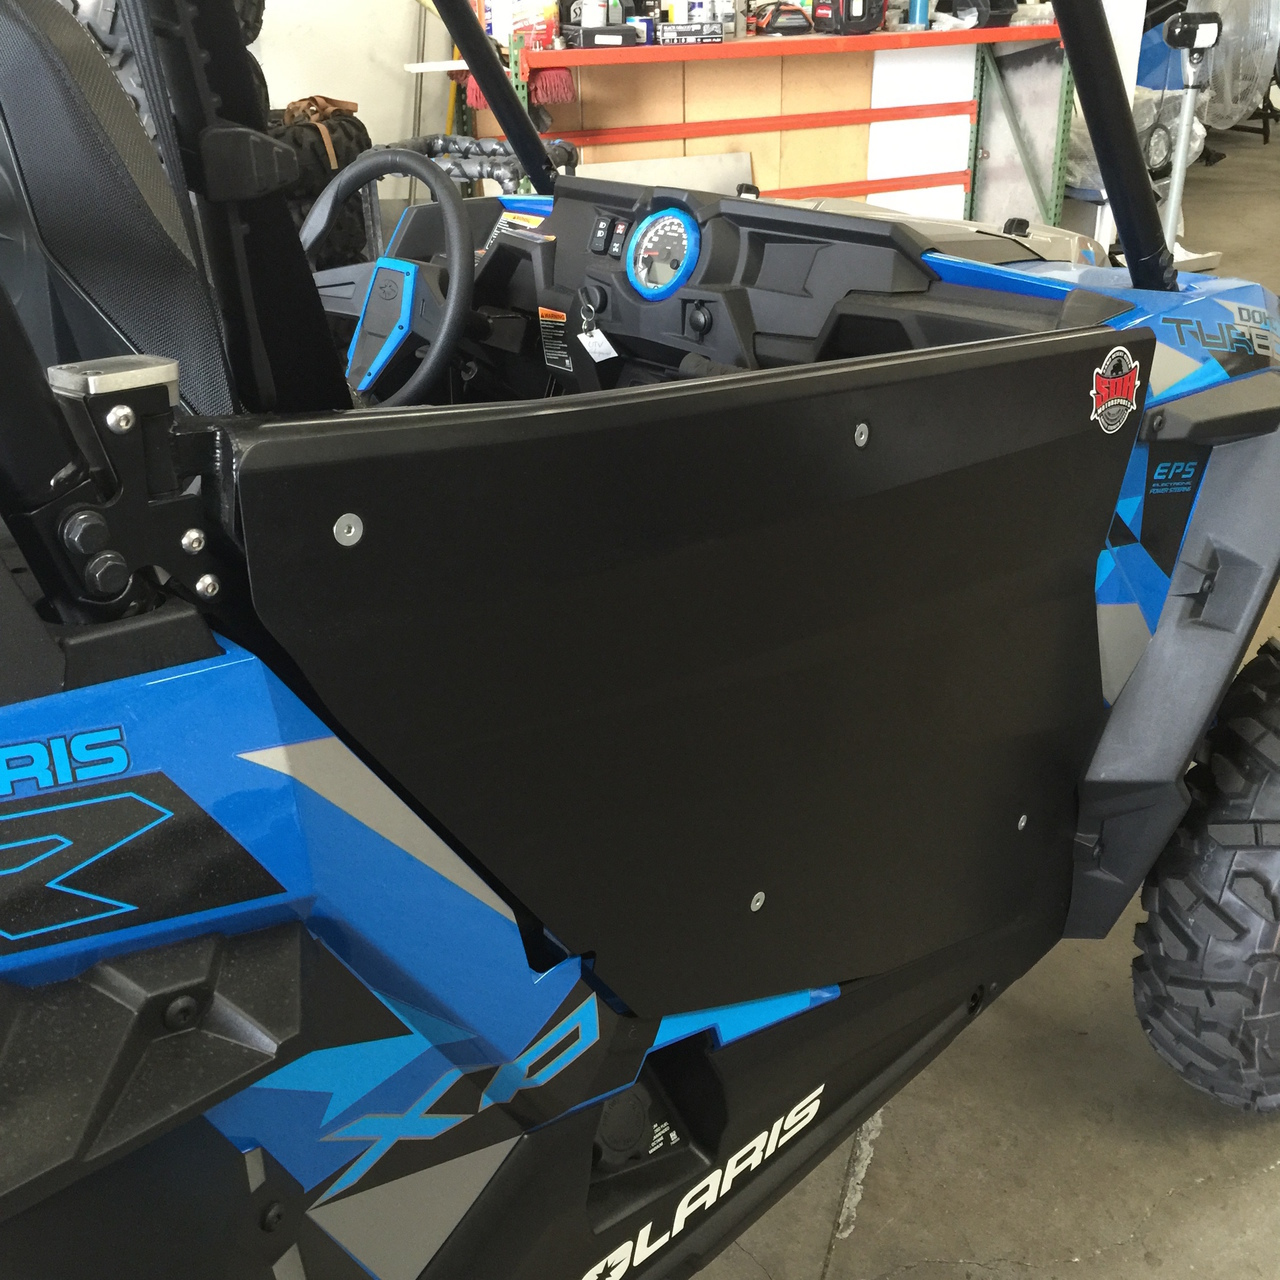 Sdr Motorsports Polaris Rzr Xp1000 Turbo Xpr 2 Bolt On